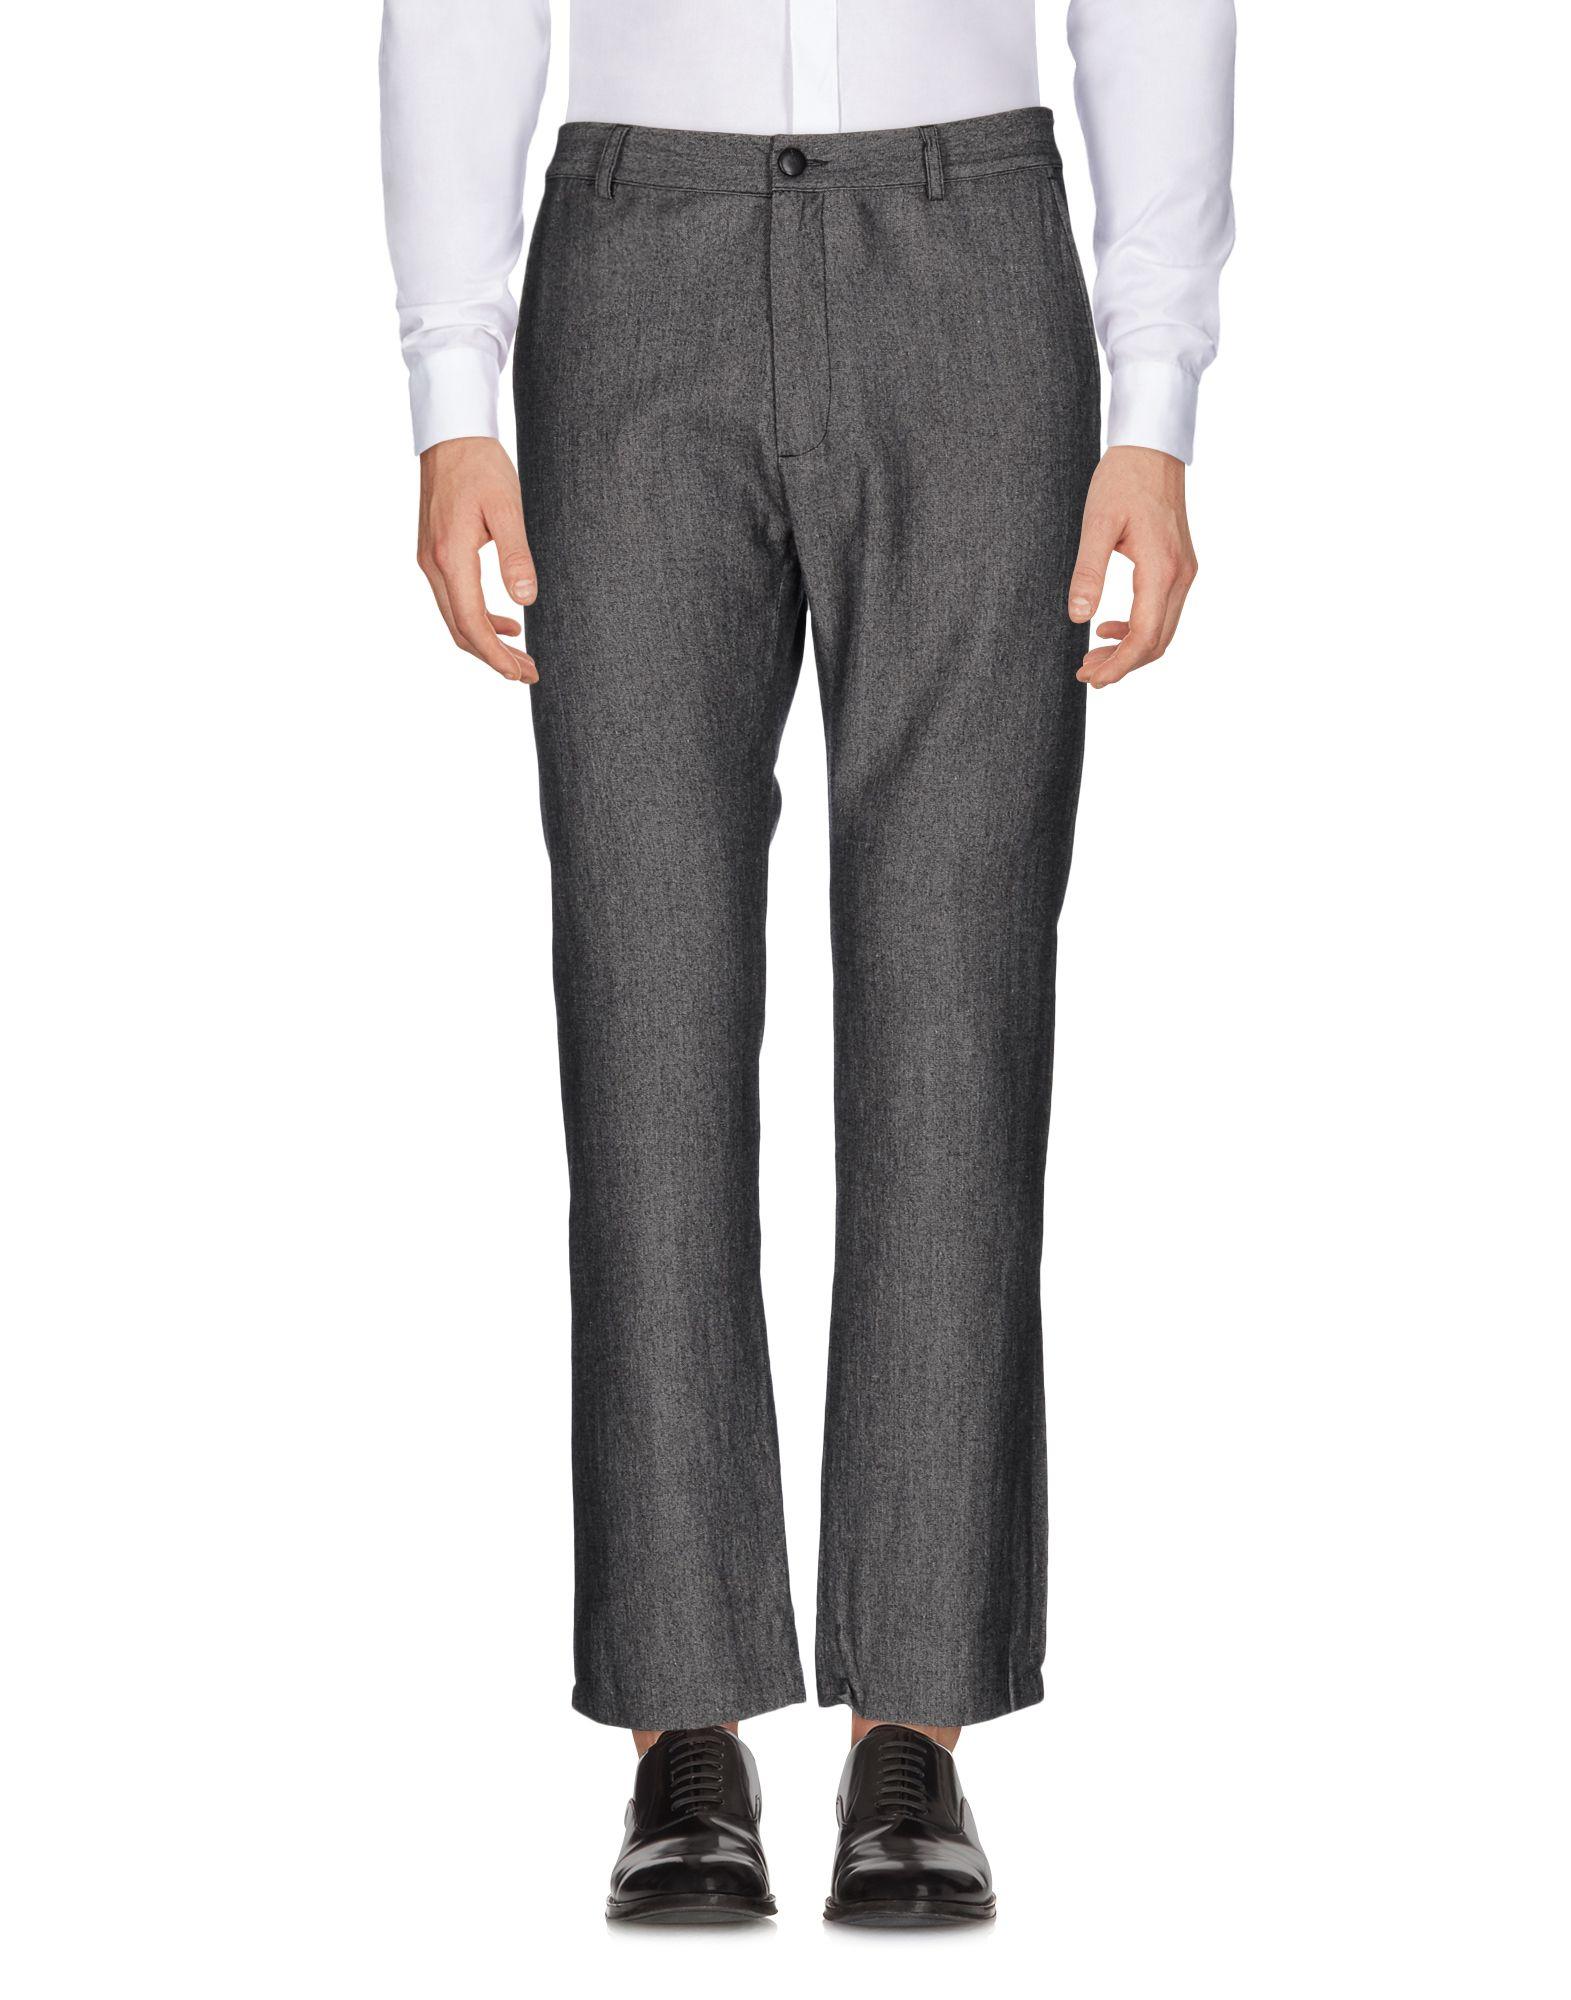 Pantalone Gerard Uomo - Acquista online su